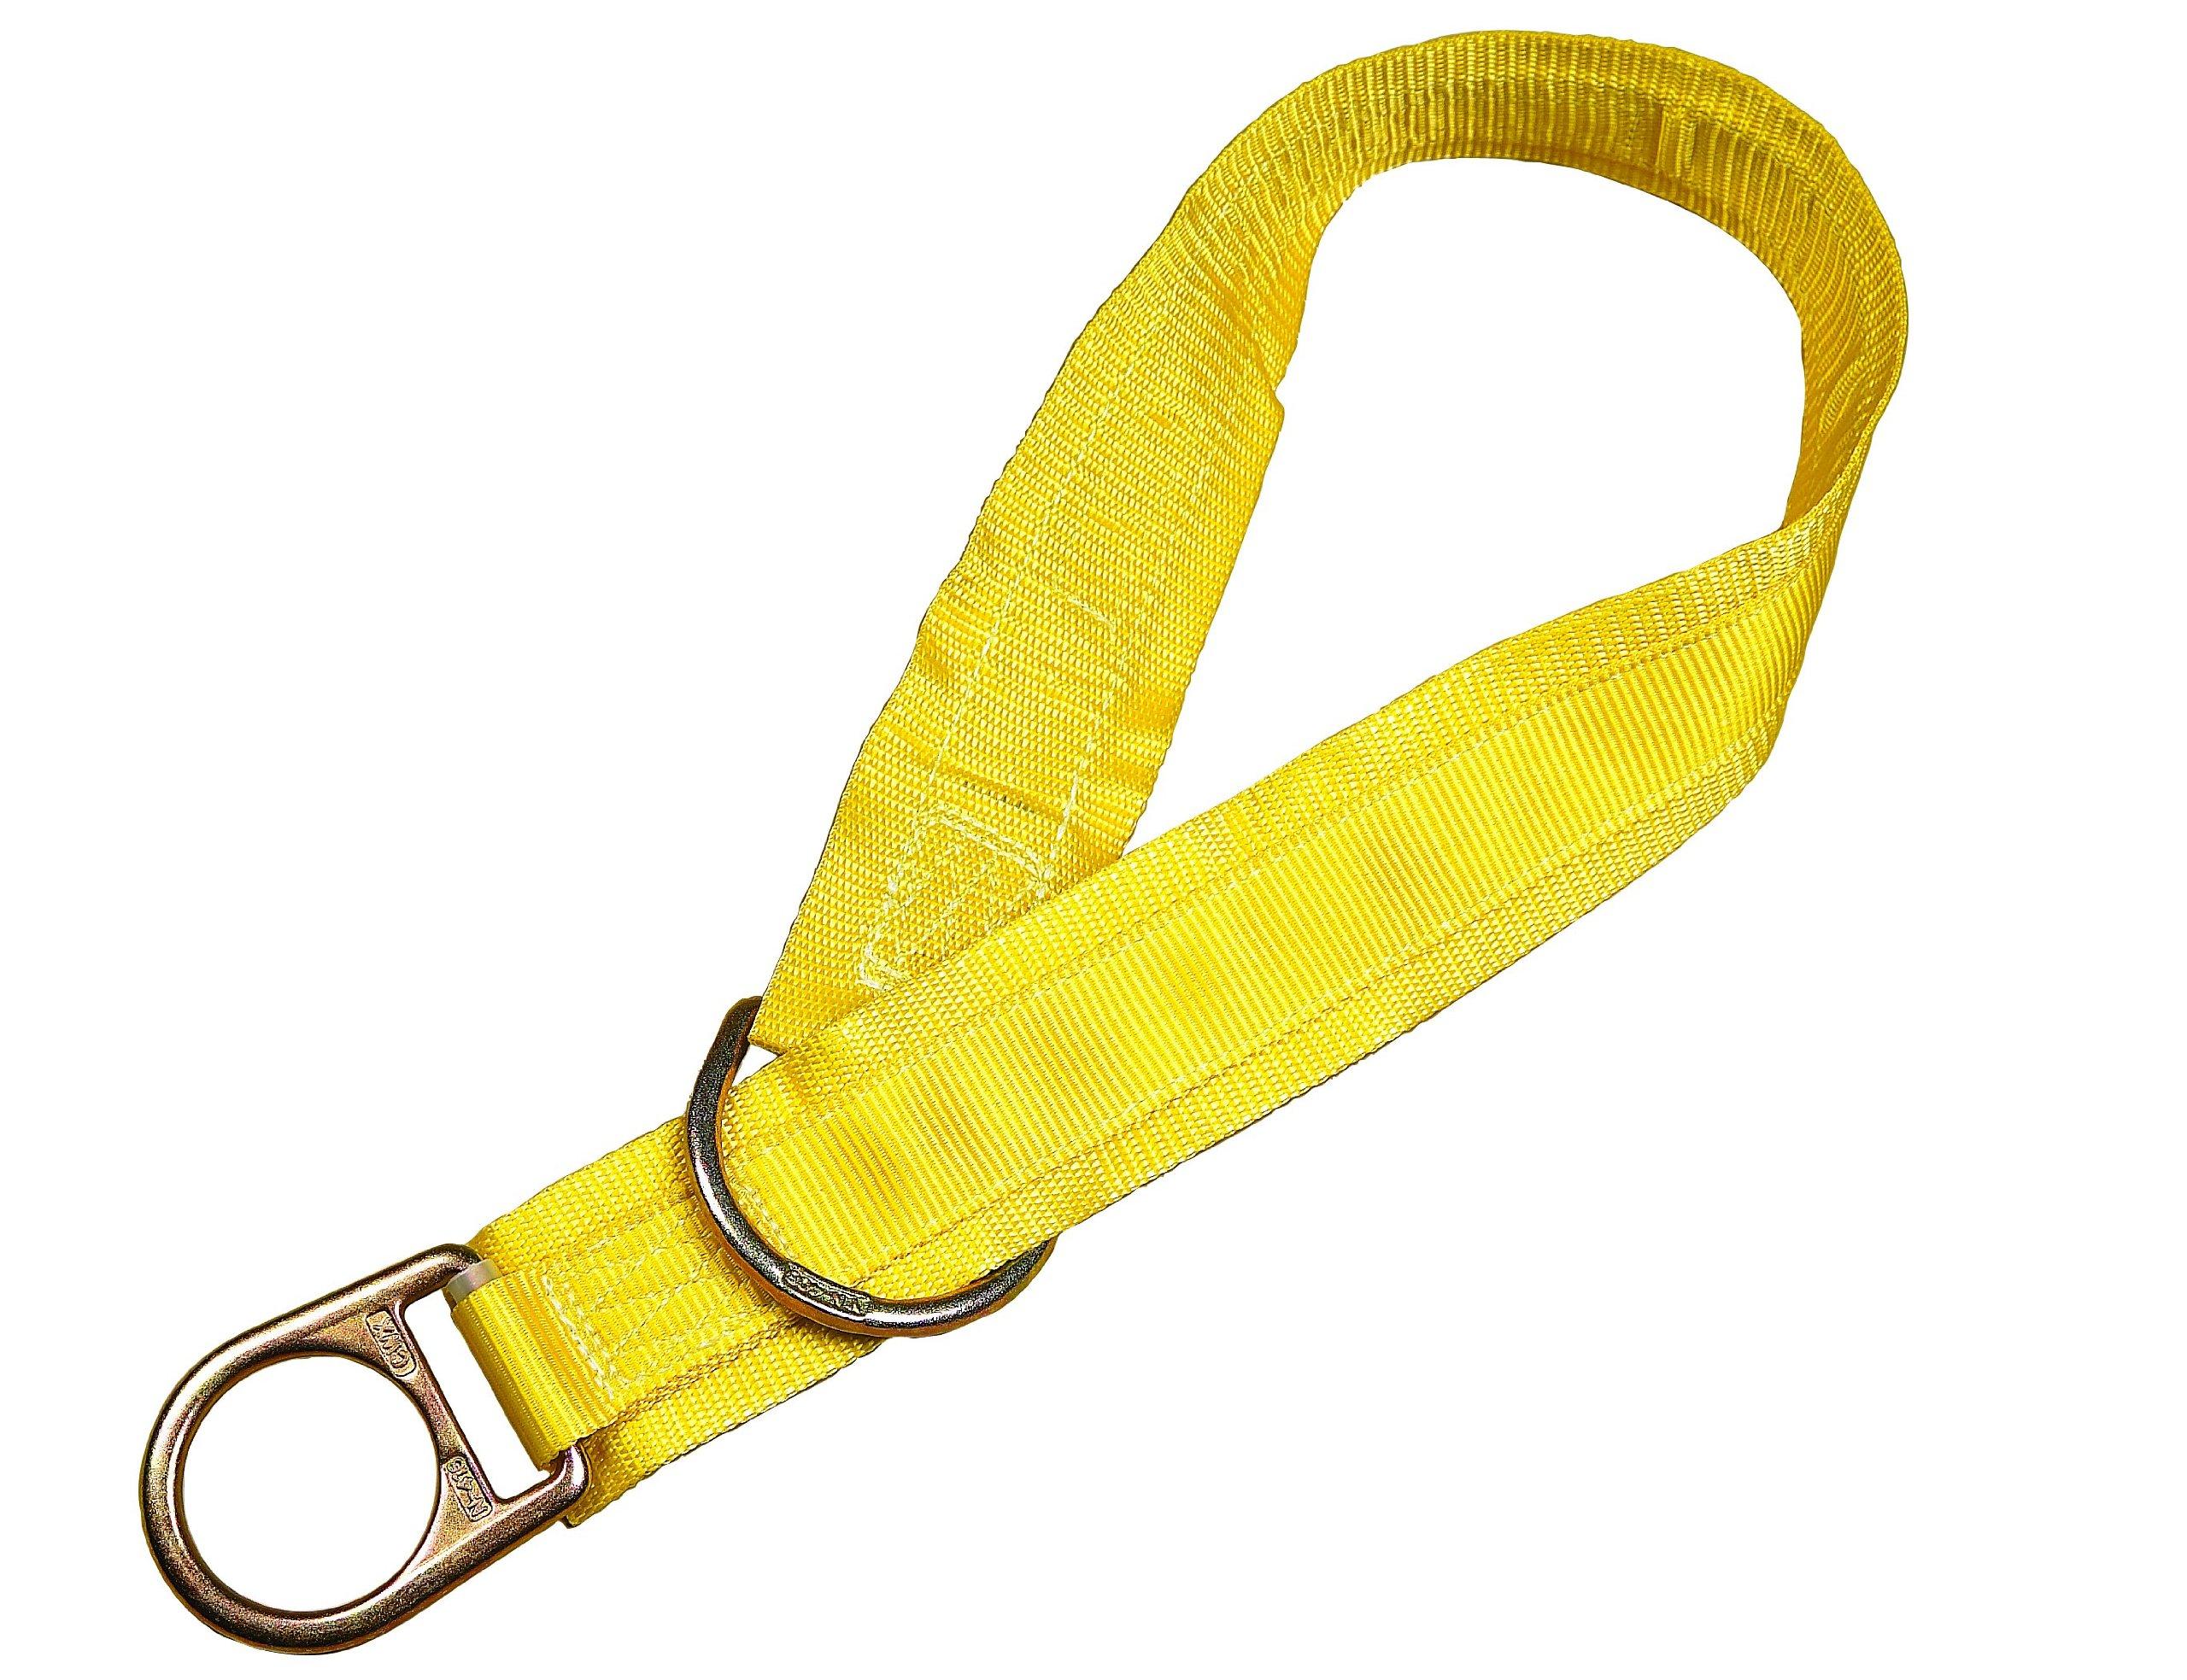 3M DBI-SALA 1003006 Tie Off Adaptor, 6', Pass-Thru Type, with 3'' Wear Pad, Yellow